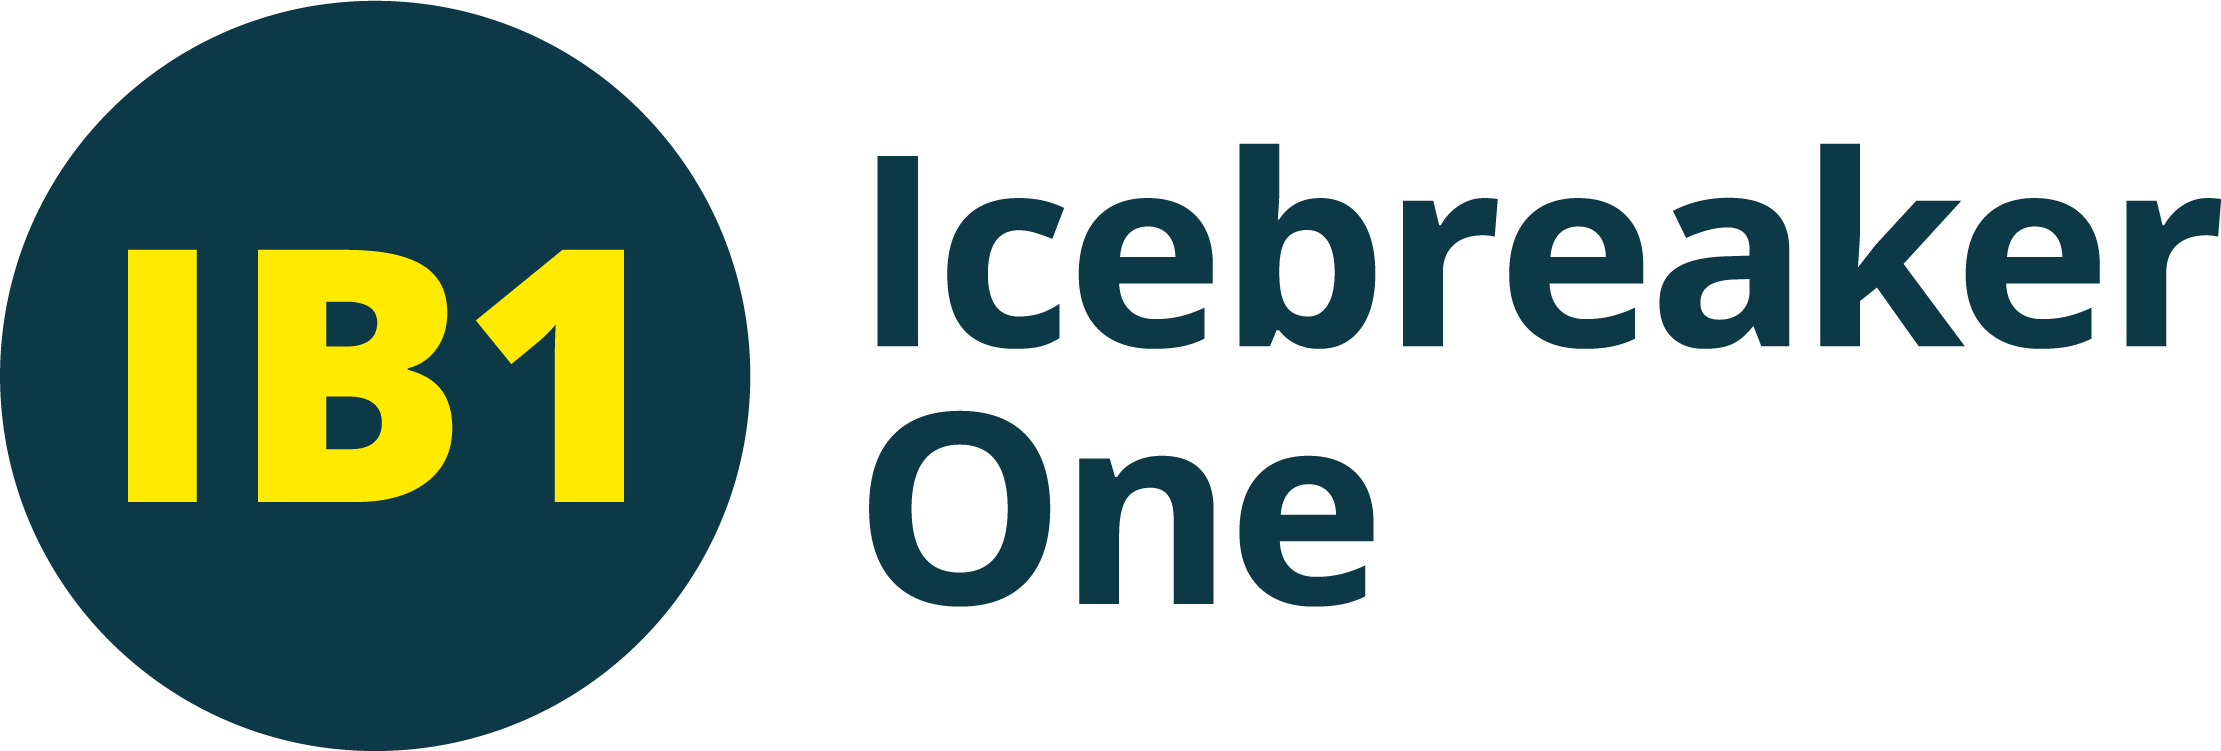 icebreakerone